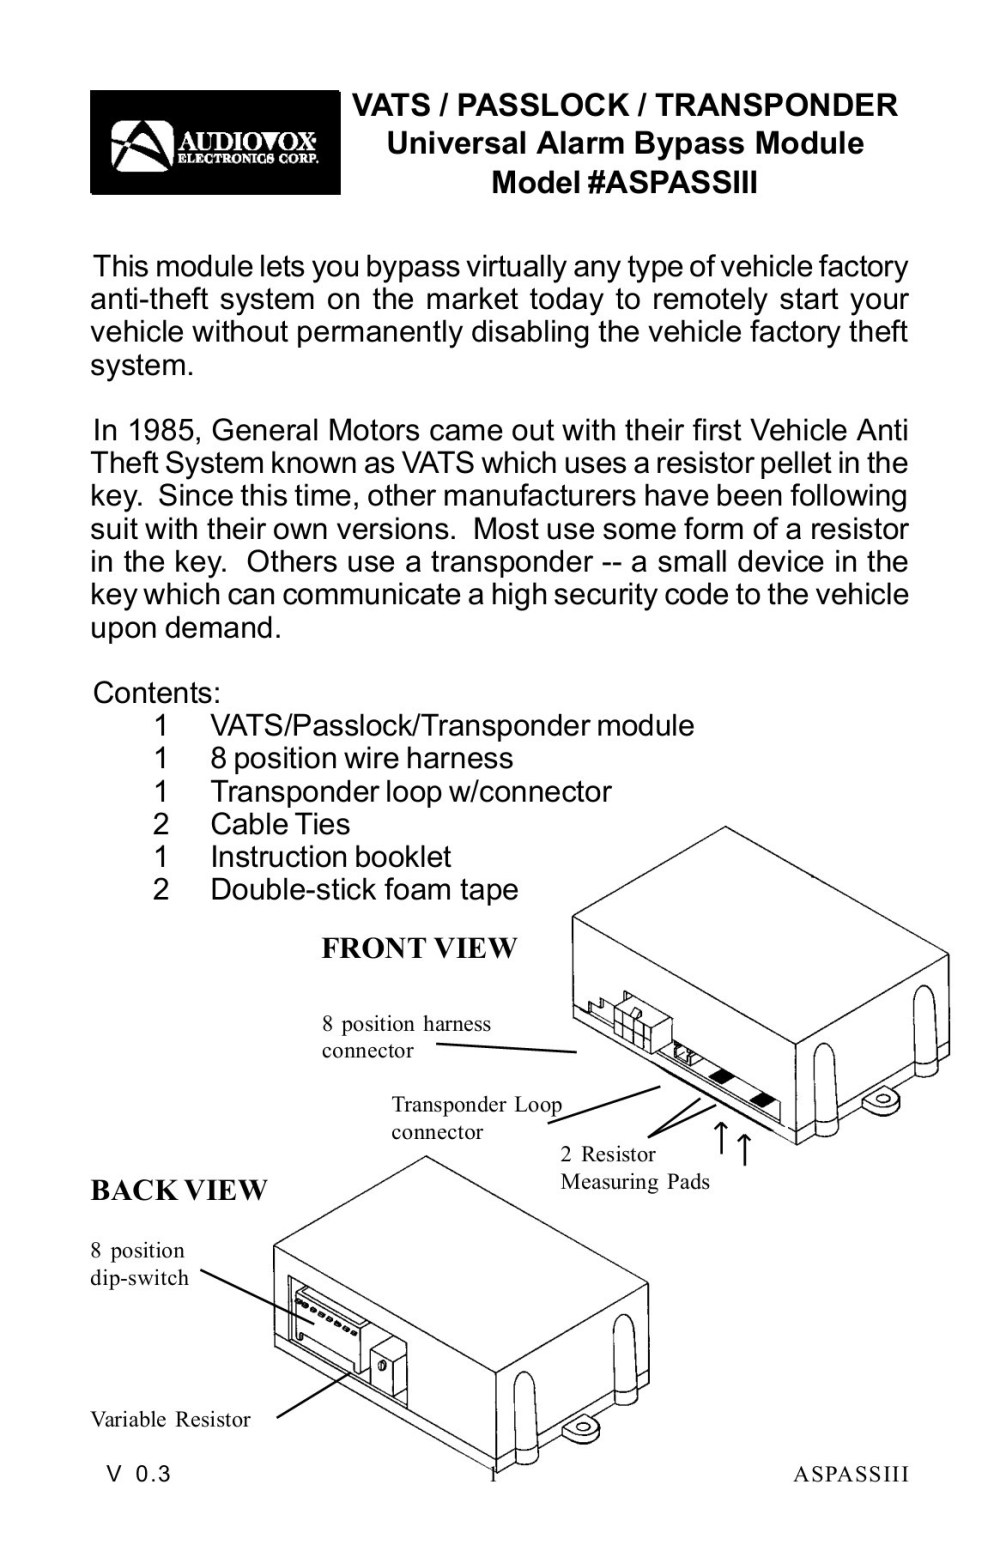 medium resolution of vats passlock transponder universal alarm bypass module pages 1 12 text version